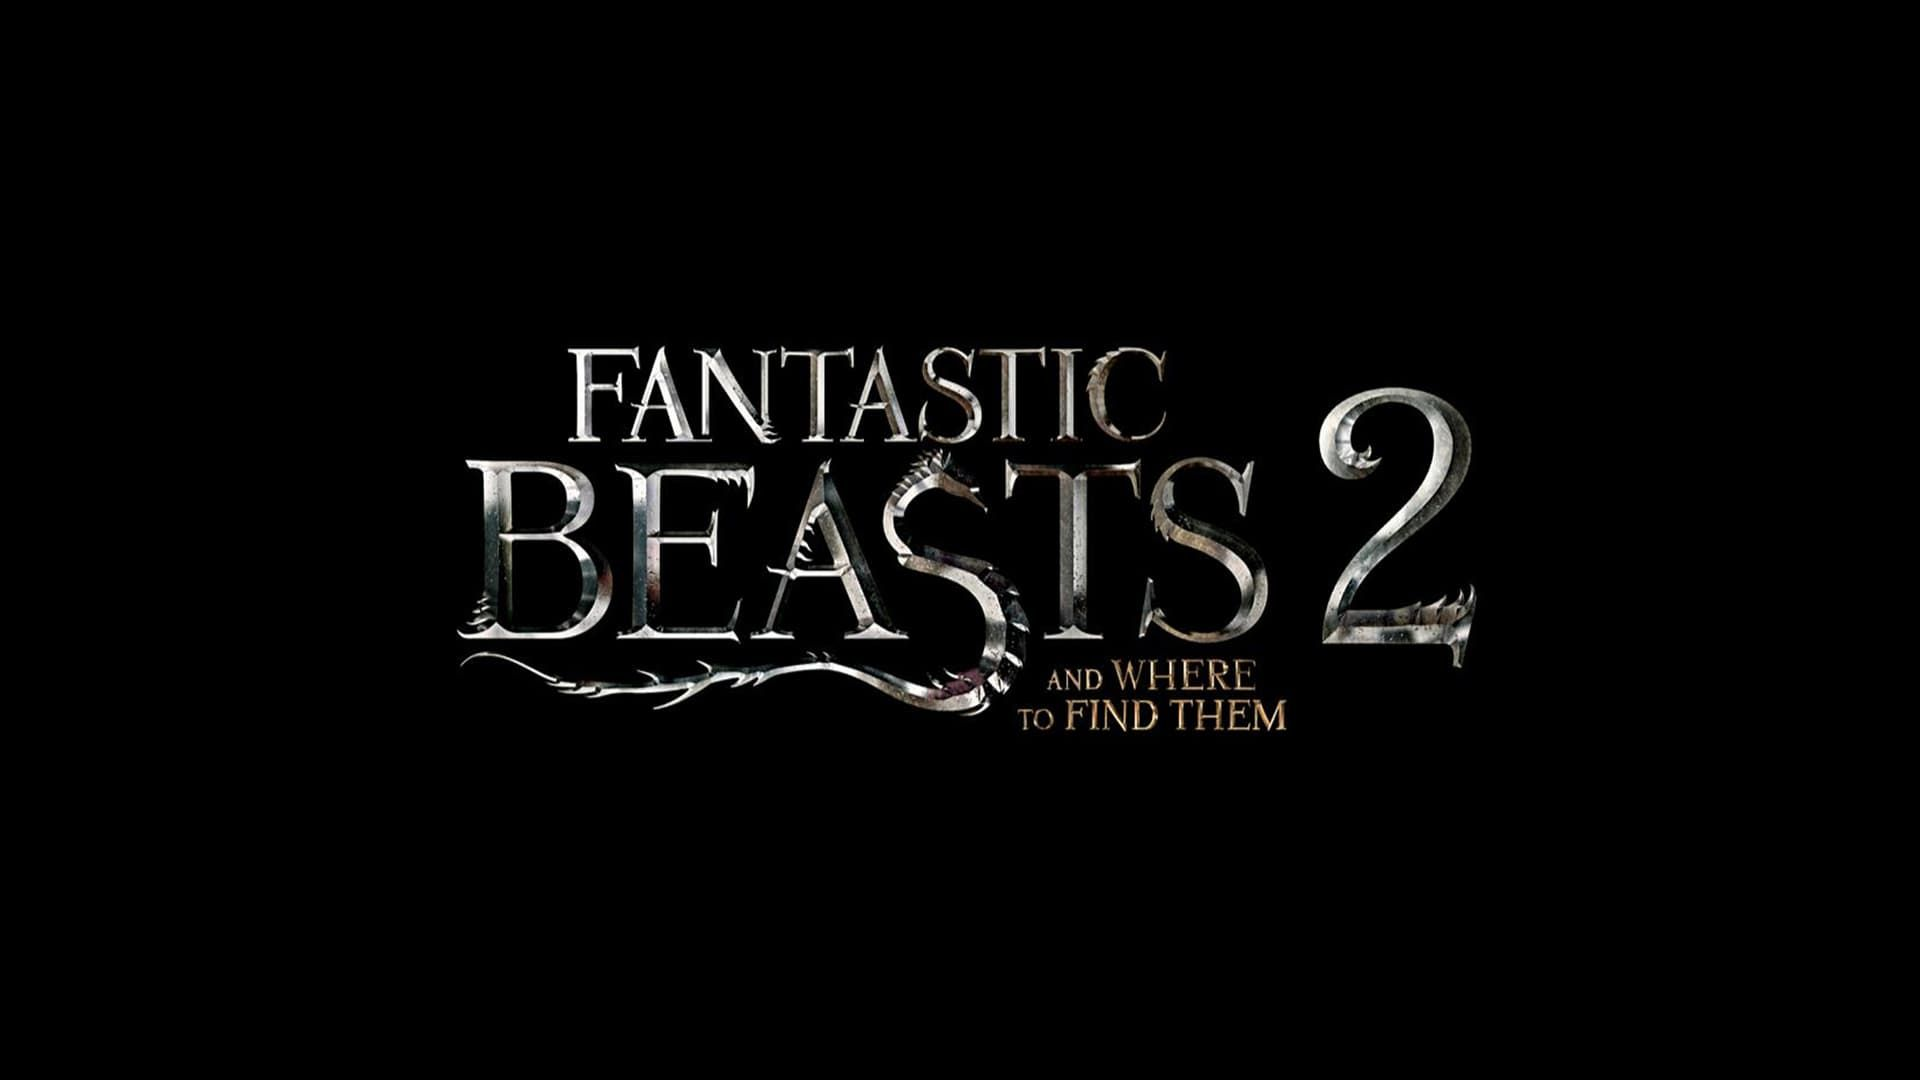 Legendas Allatok Grindelwald Buntettei 2018 Online Teljes Film Filmek Magyarul Letoltes Hd Gellert Fantastic Beasts Free Movies Online Full Movies Online Free